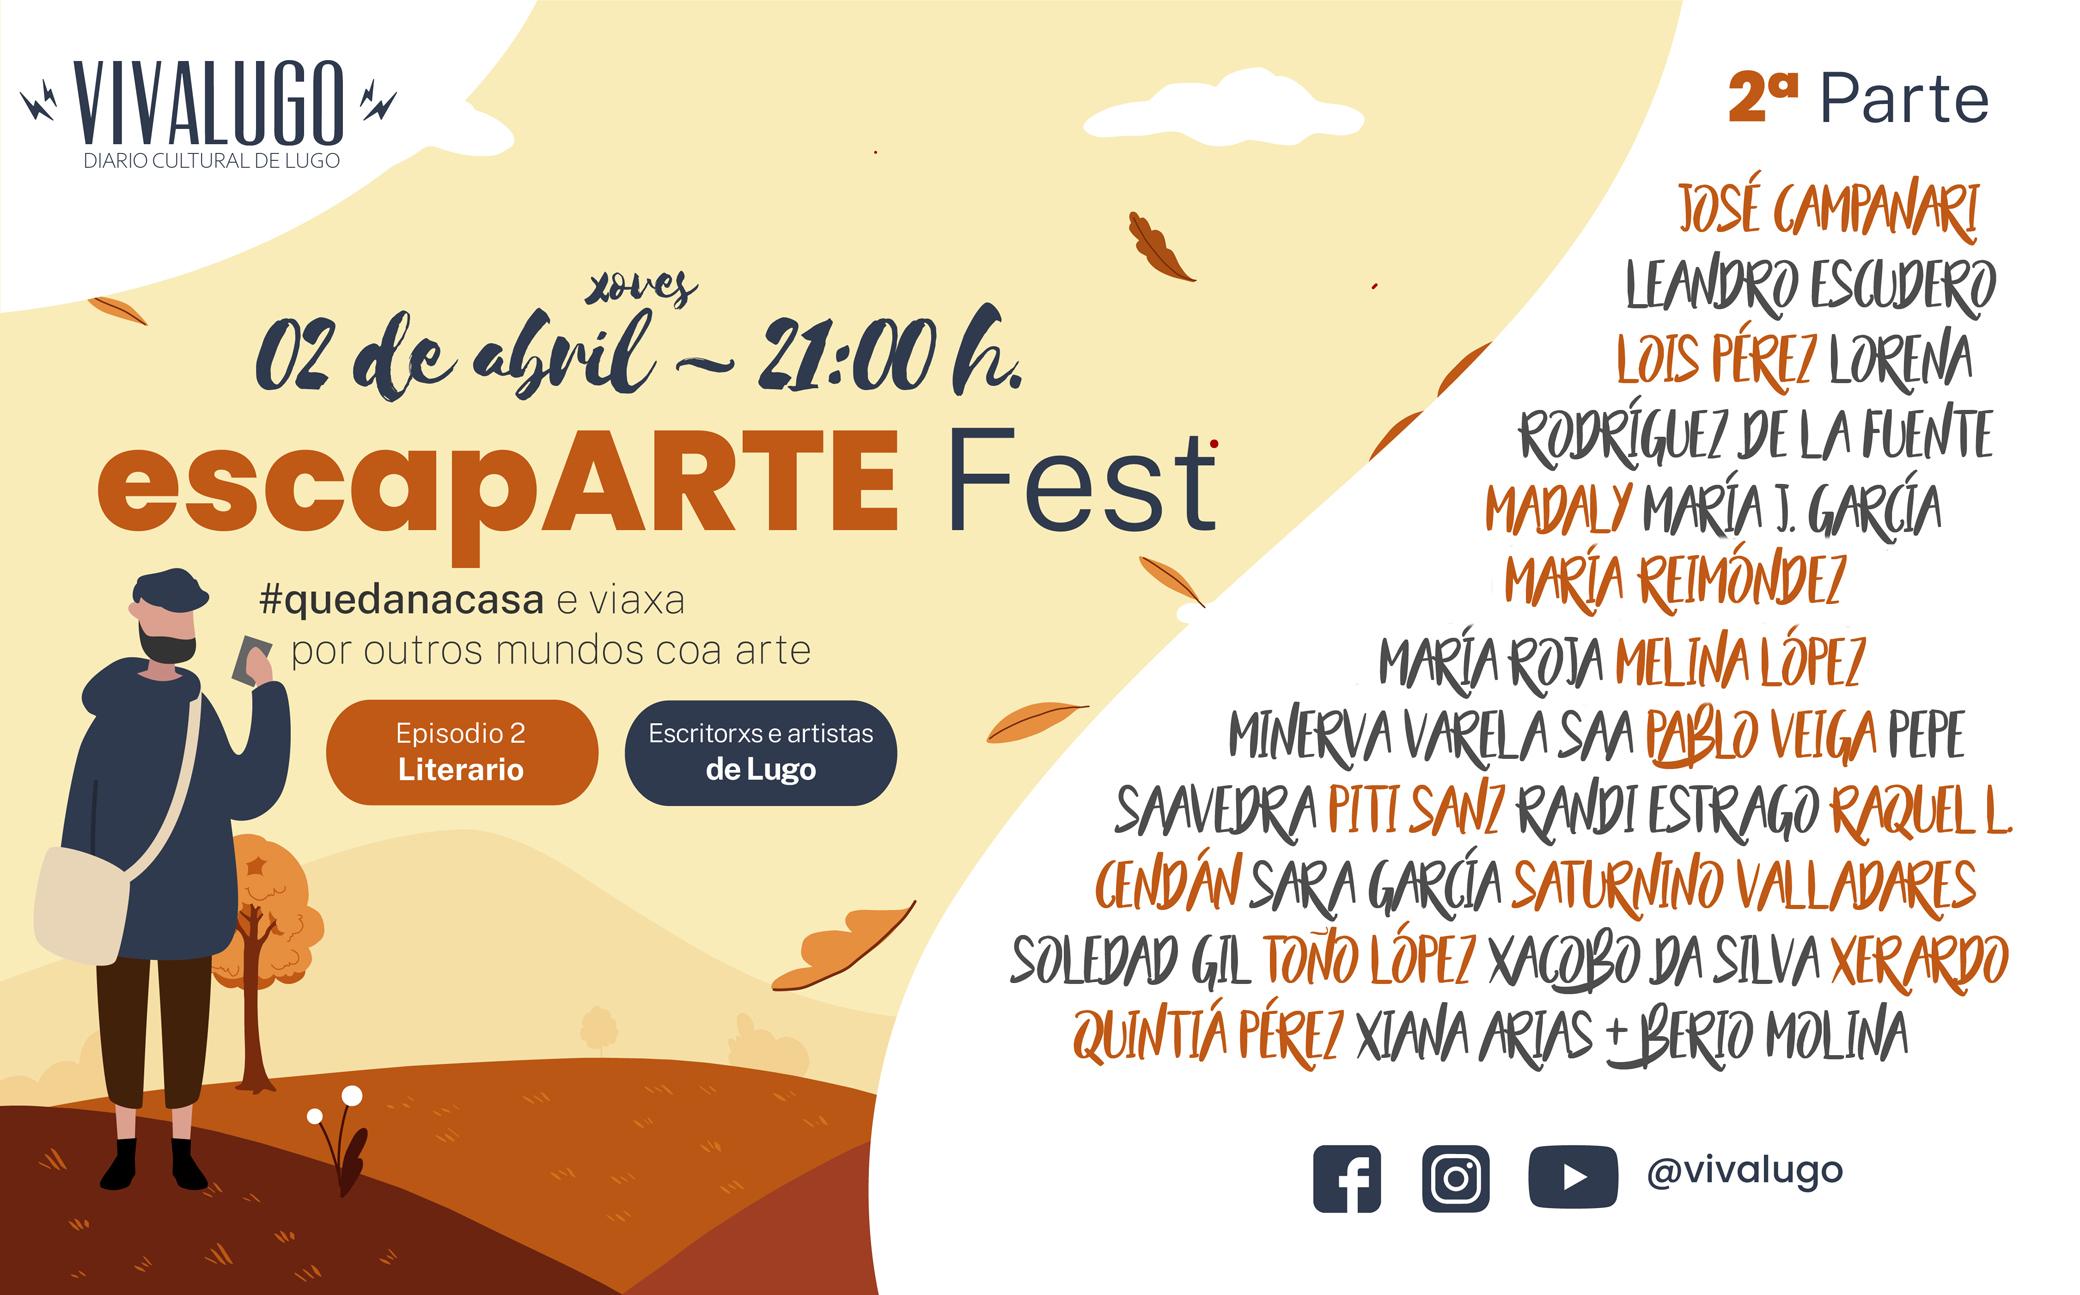 Cartel do escapARTE Fest - Literario on line